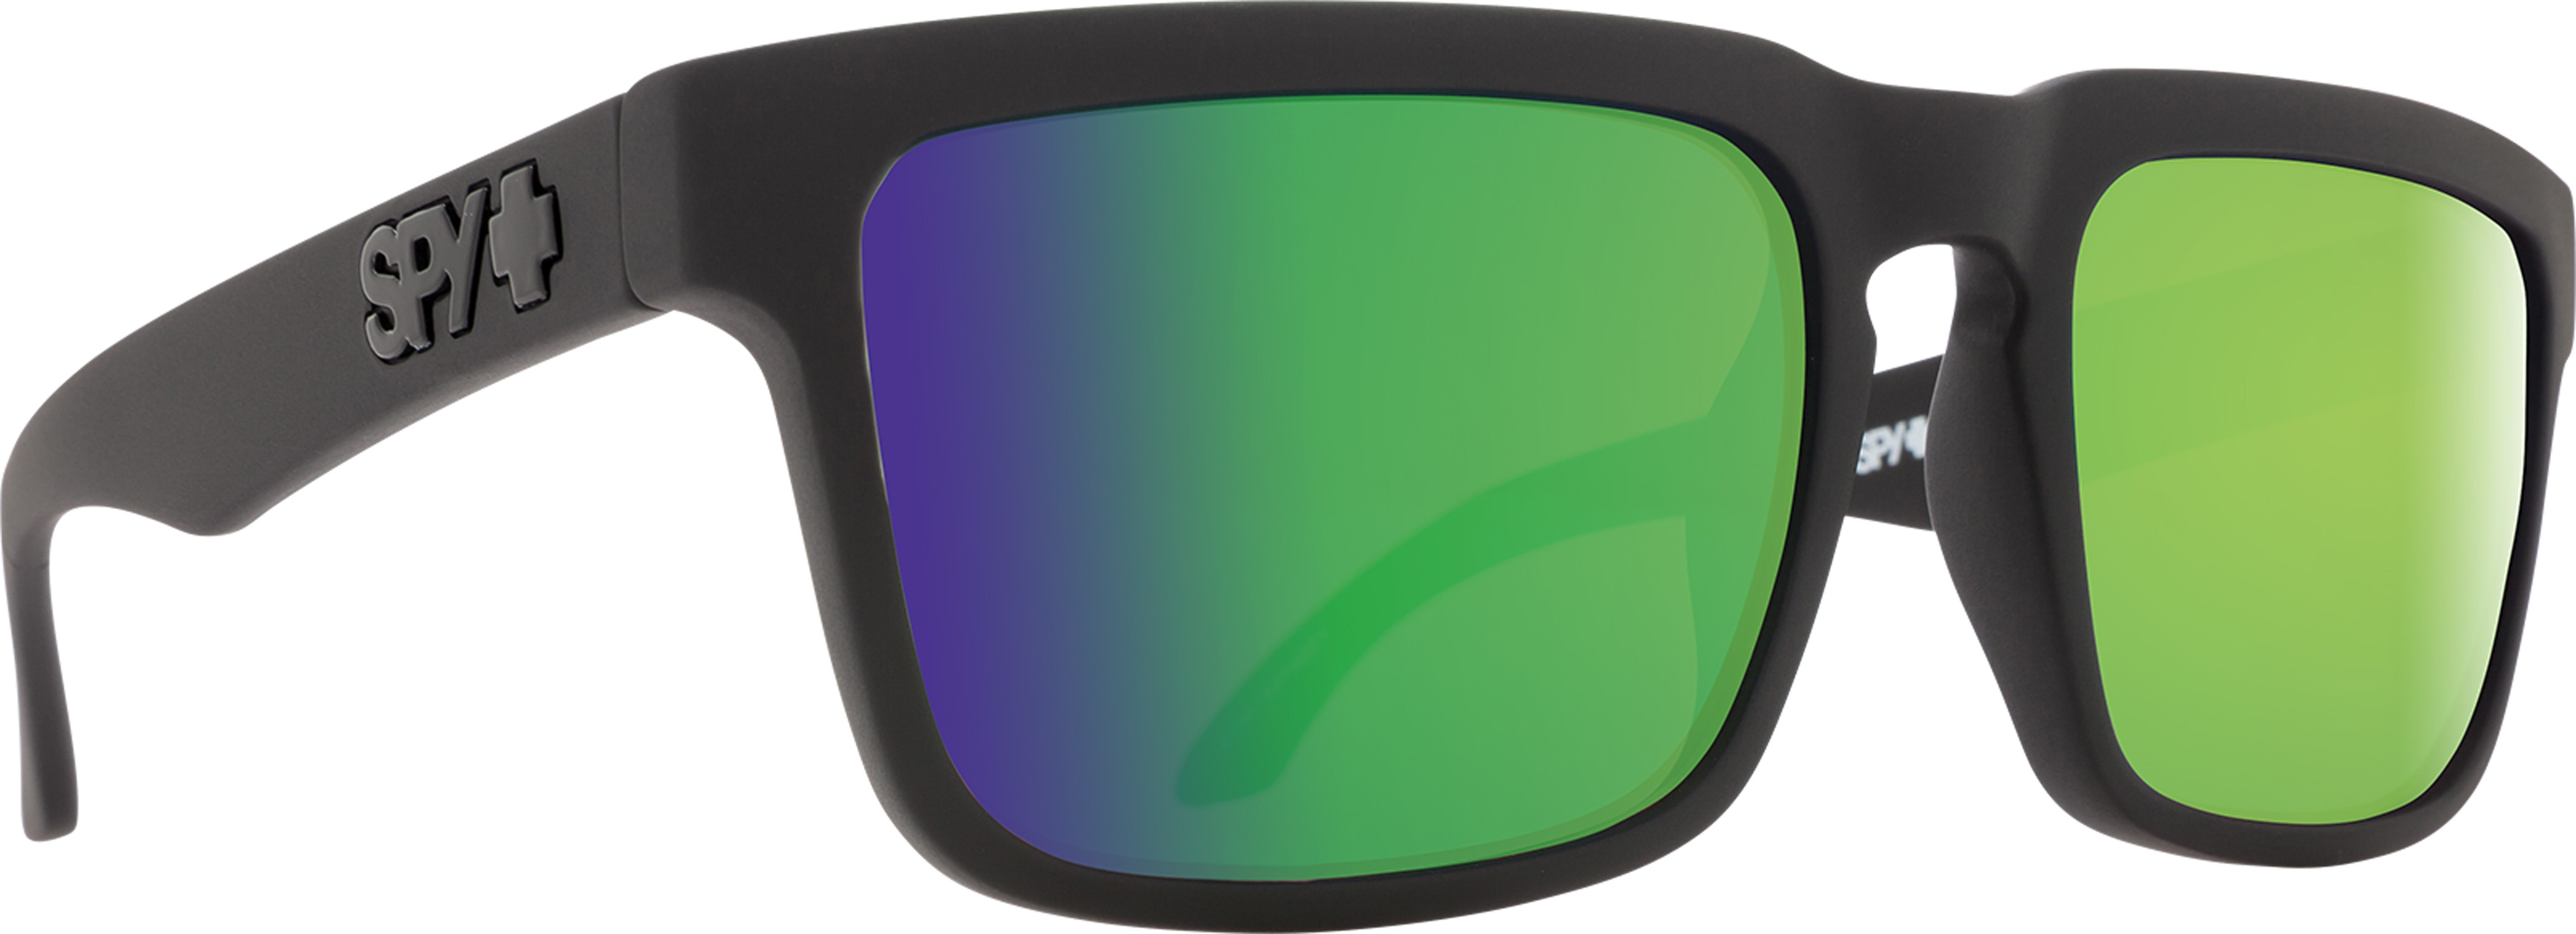 f84bc038124 Spy Helm Sunglasses - thumbnail 1